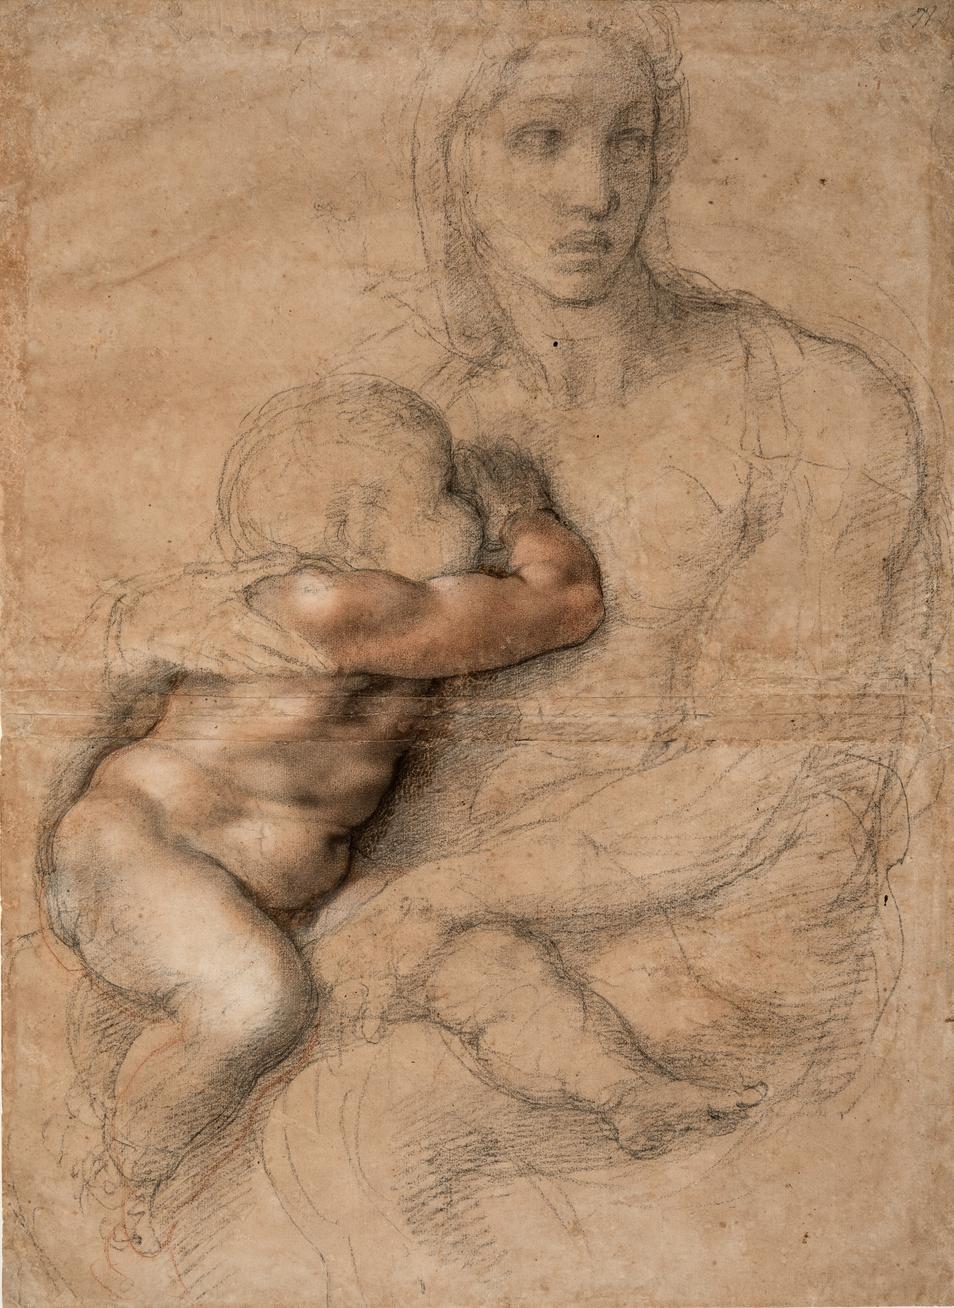 Michelangelo 3.jpg